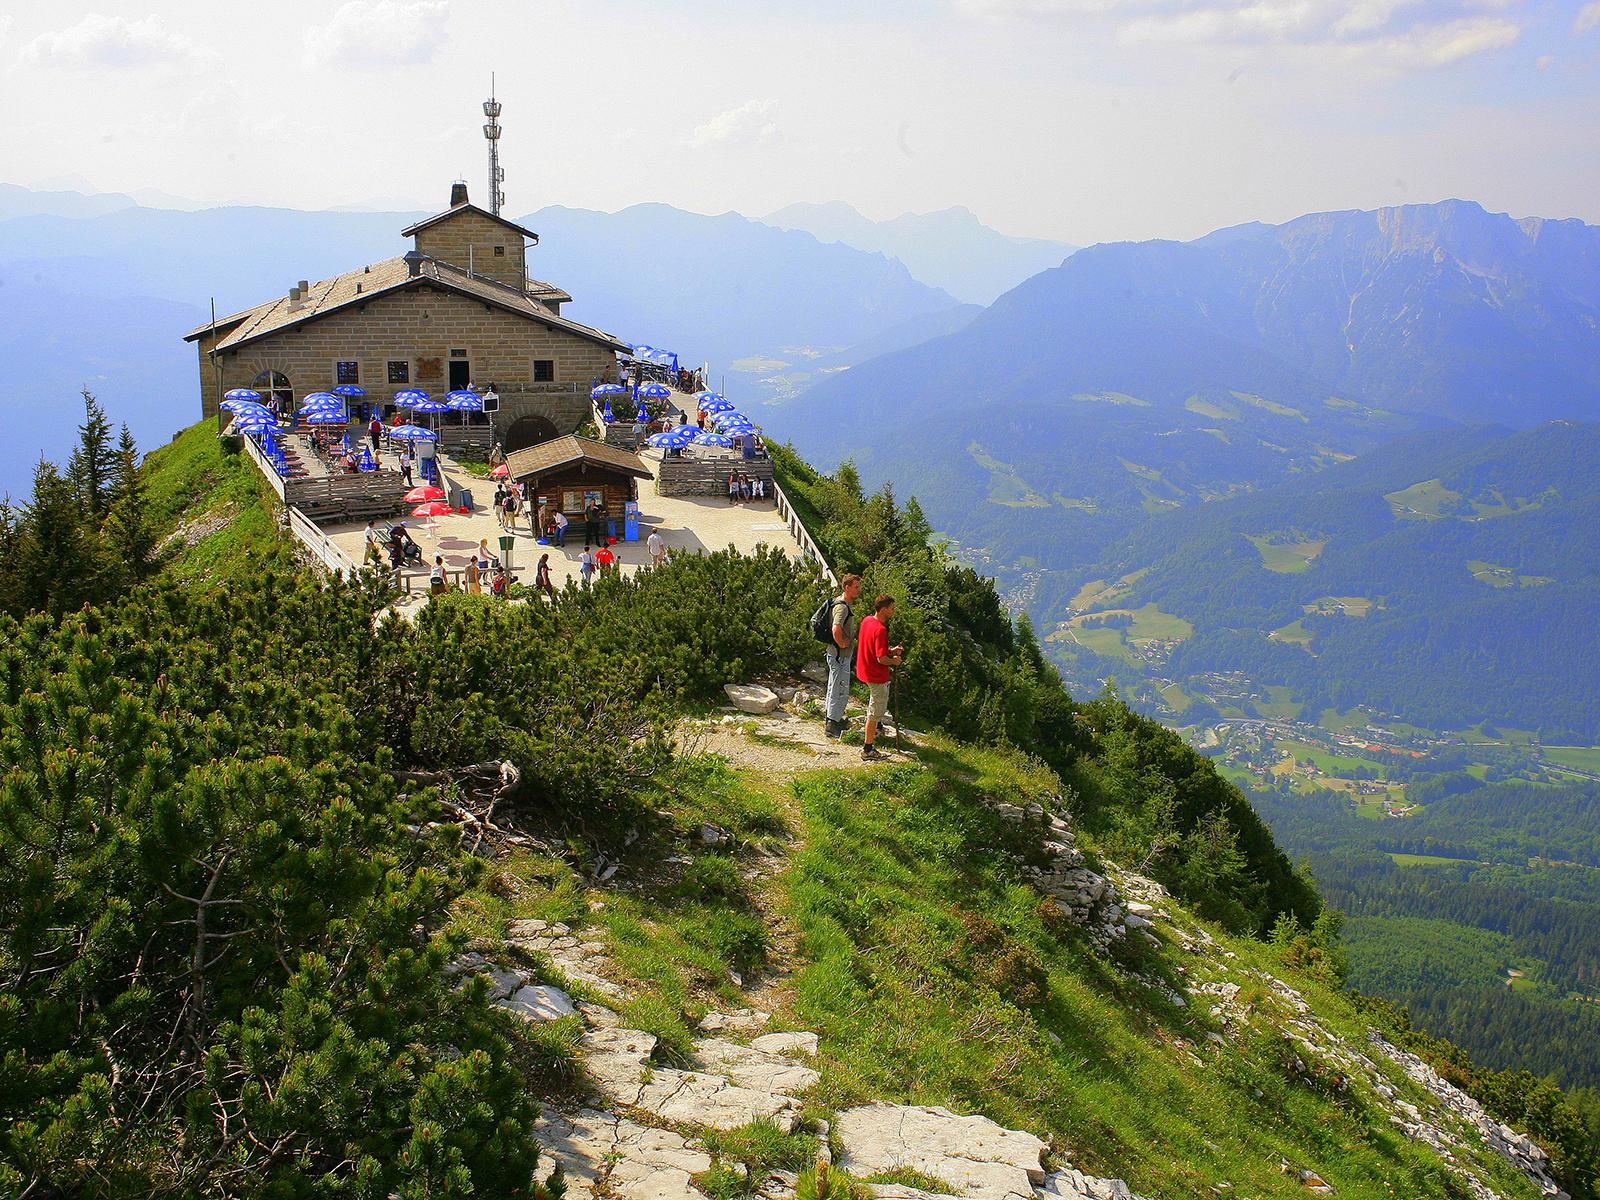 Motocyklem do Austrii